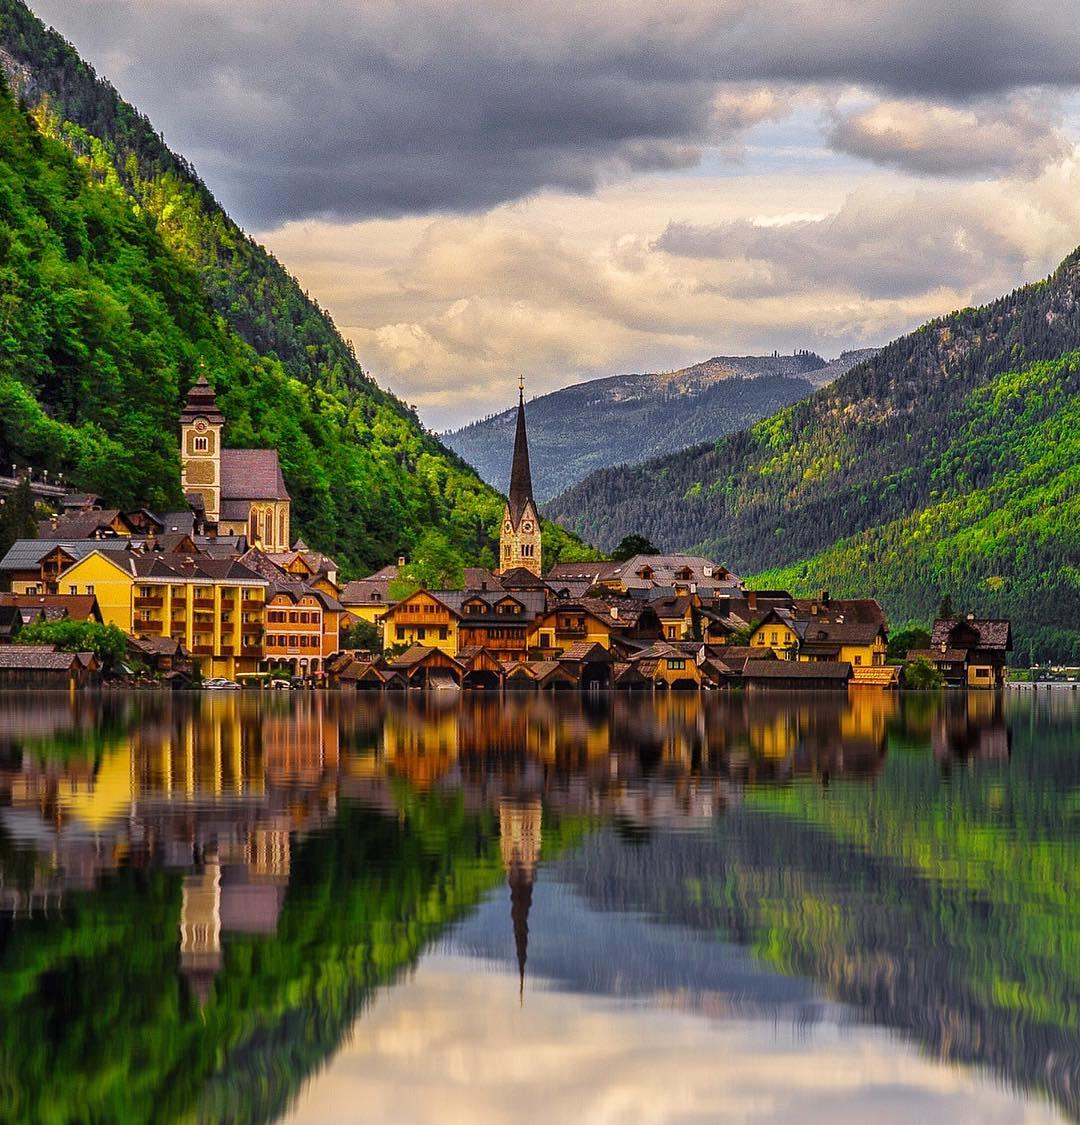 test Twitter Media - RT @_ahsanR: Awesome Hallstatt, Austria #photo Kardinalmelon https://t.co/gR6KQ6gHEb